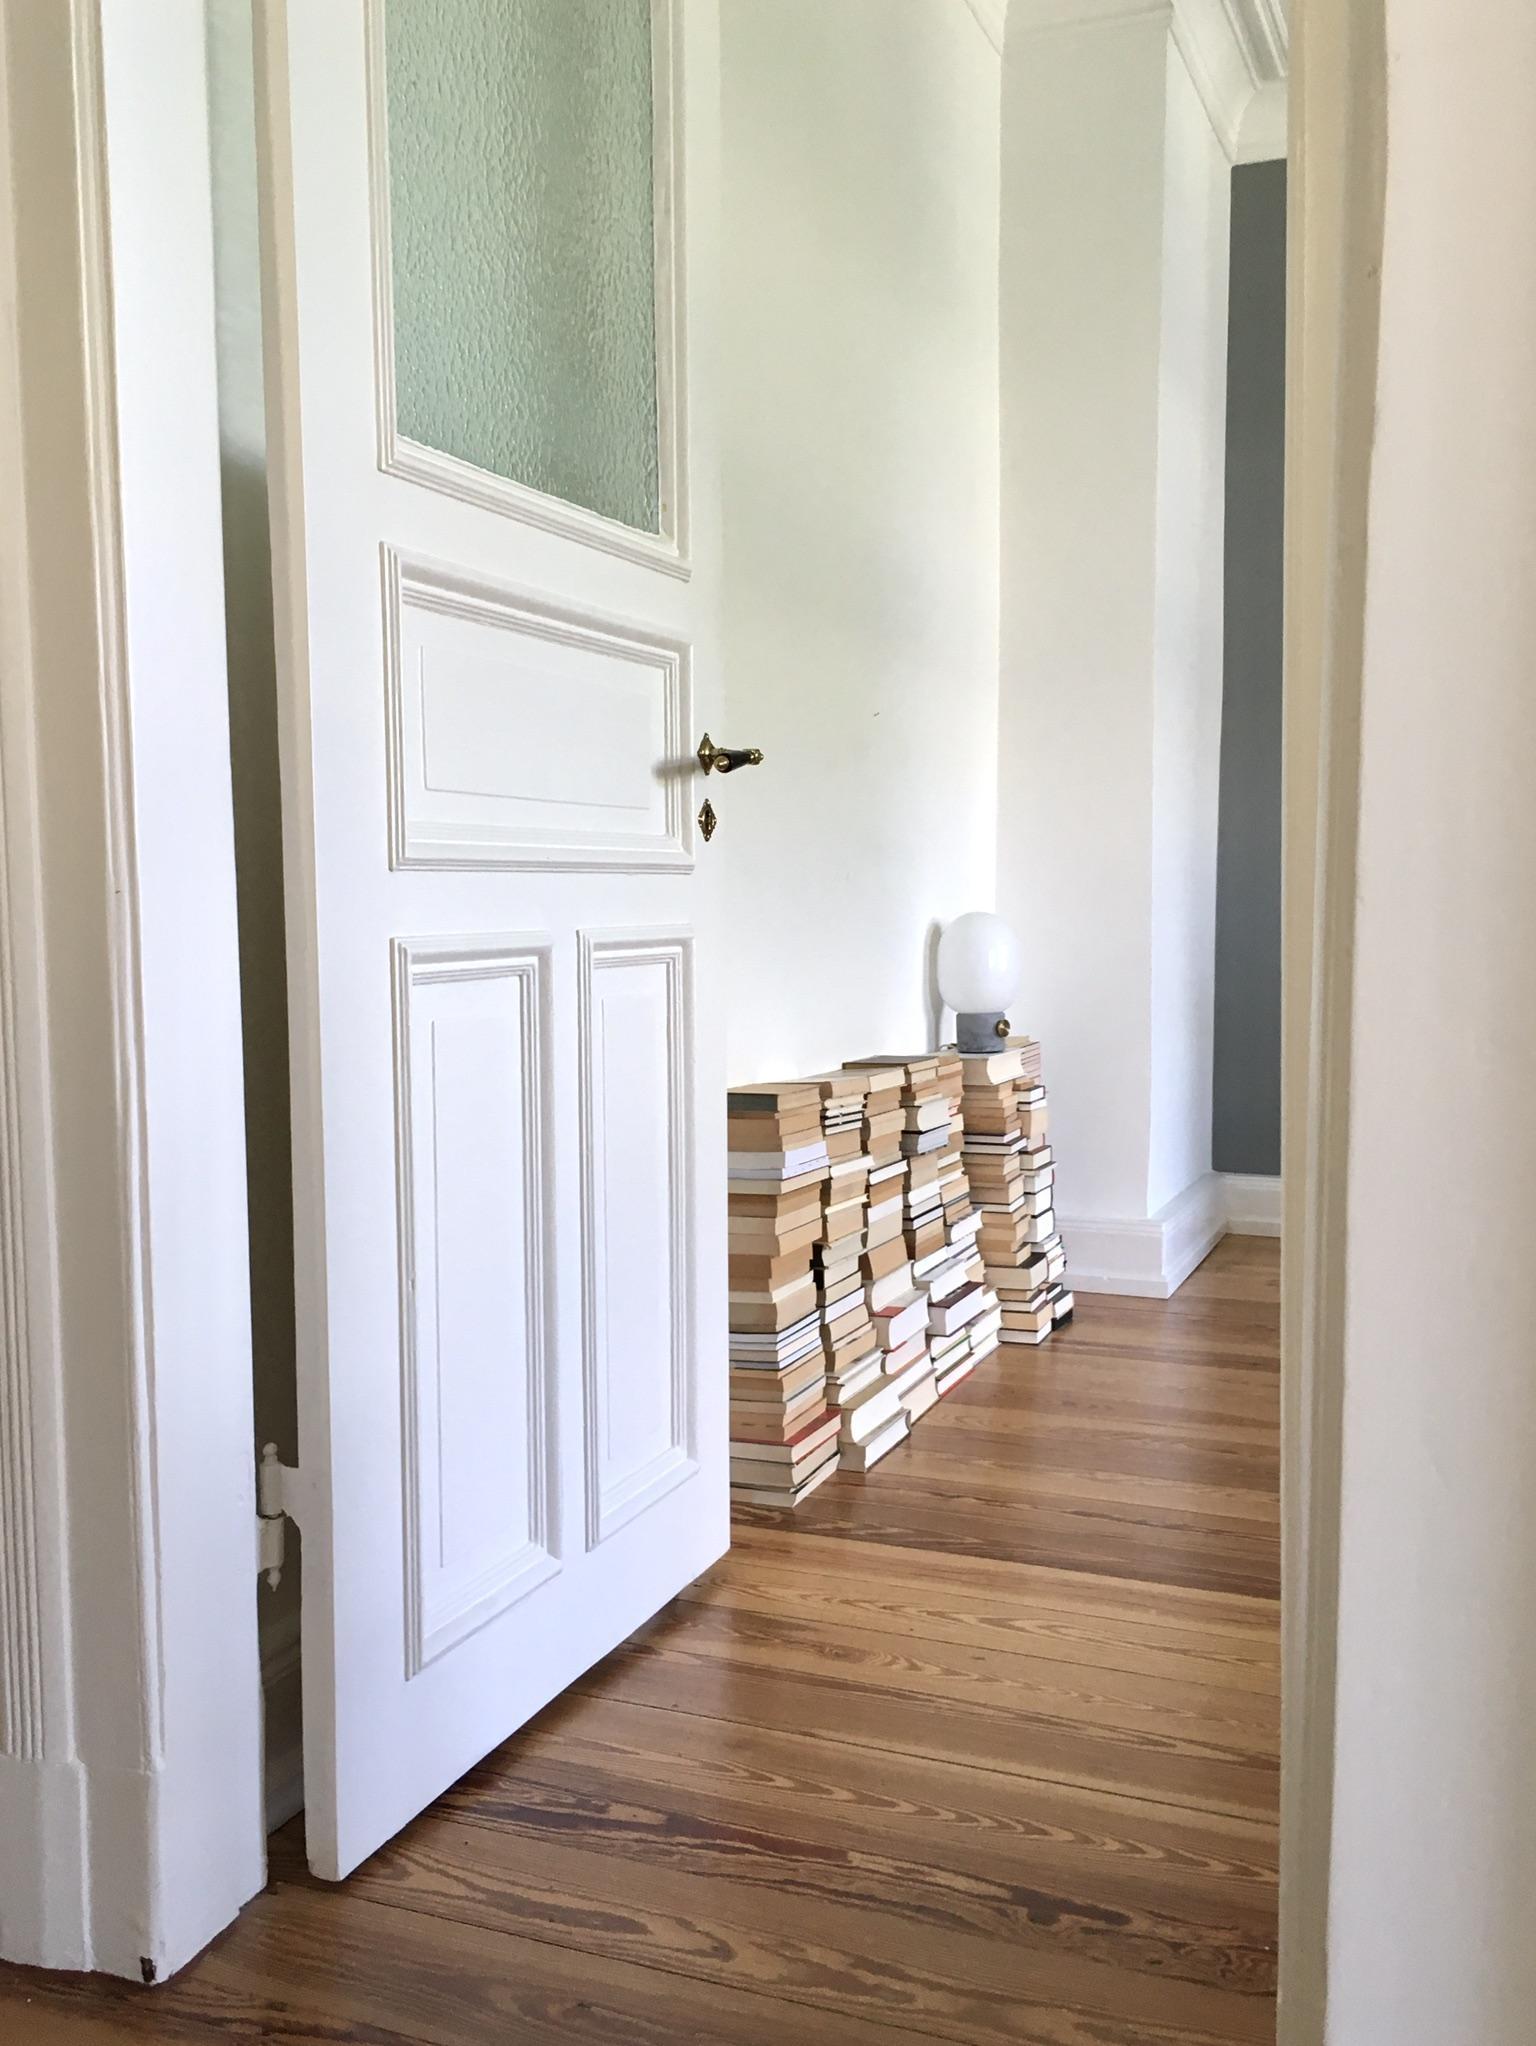 Wohnideen graue wand eigenschaften wohndesign - Trendfarben fur wande ...